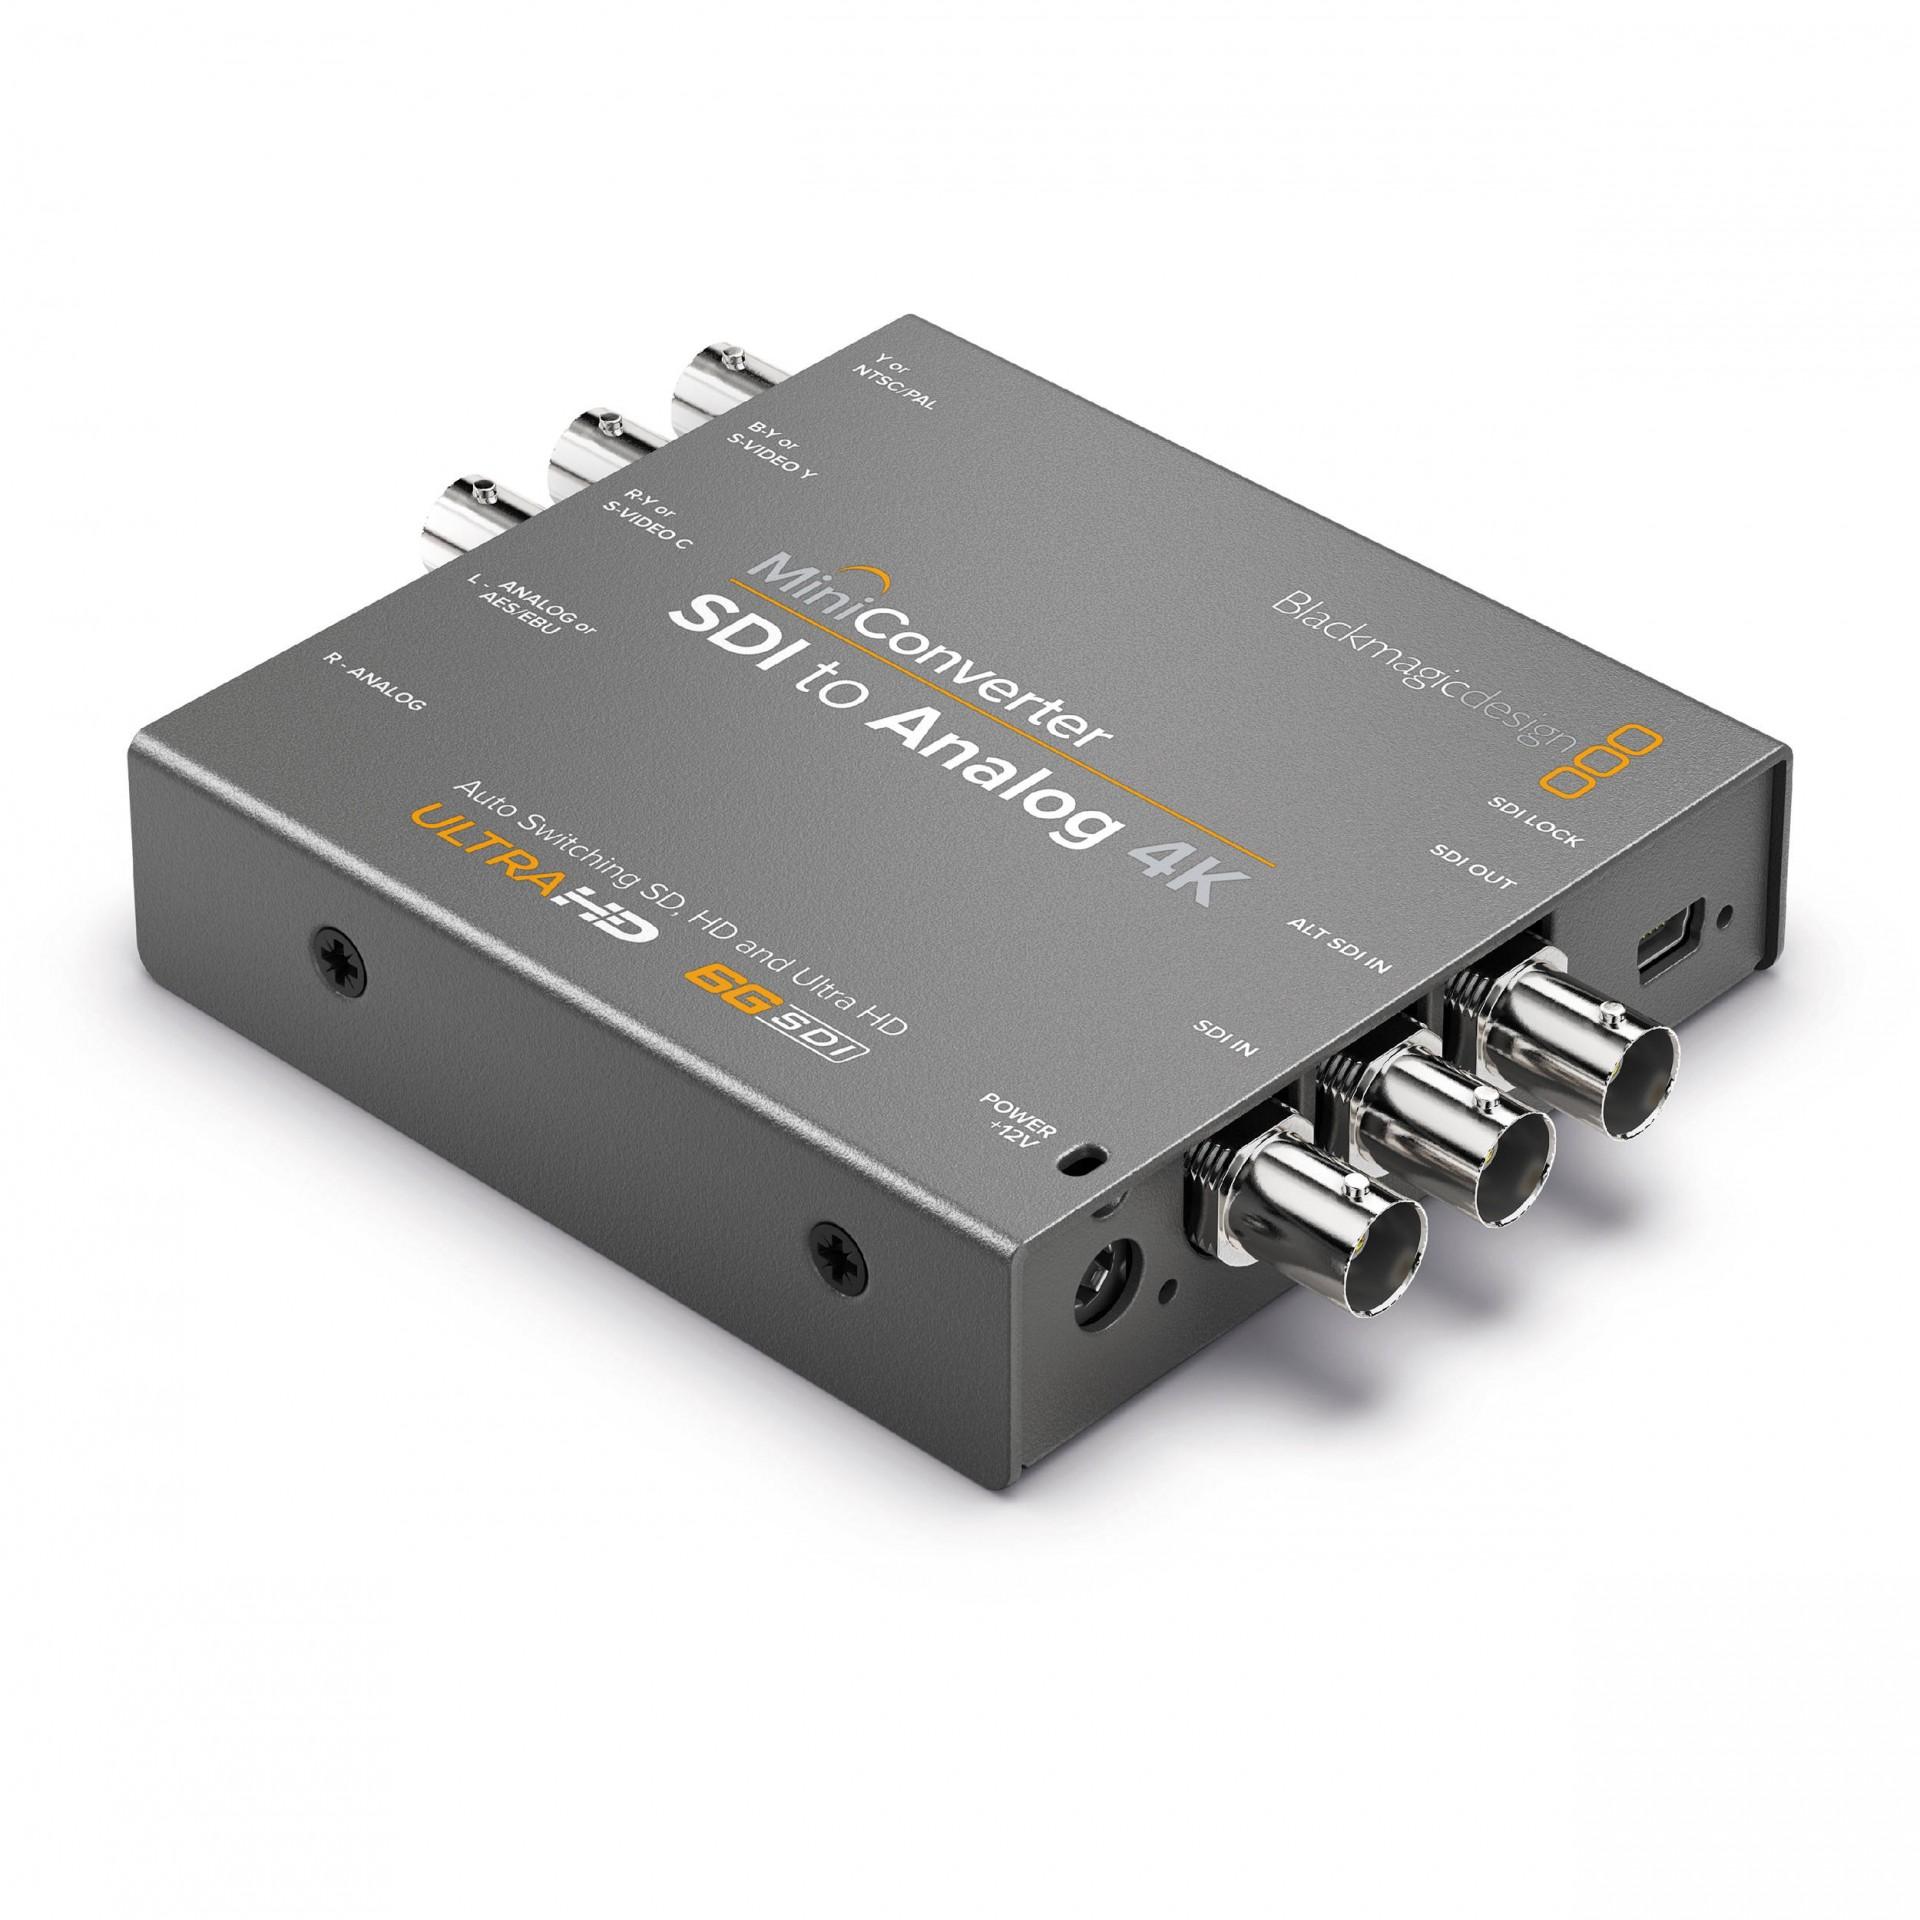 Blackmagic Mini Converter - SDI to Analog 4K